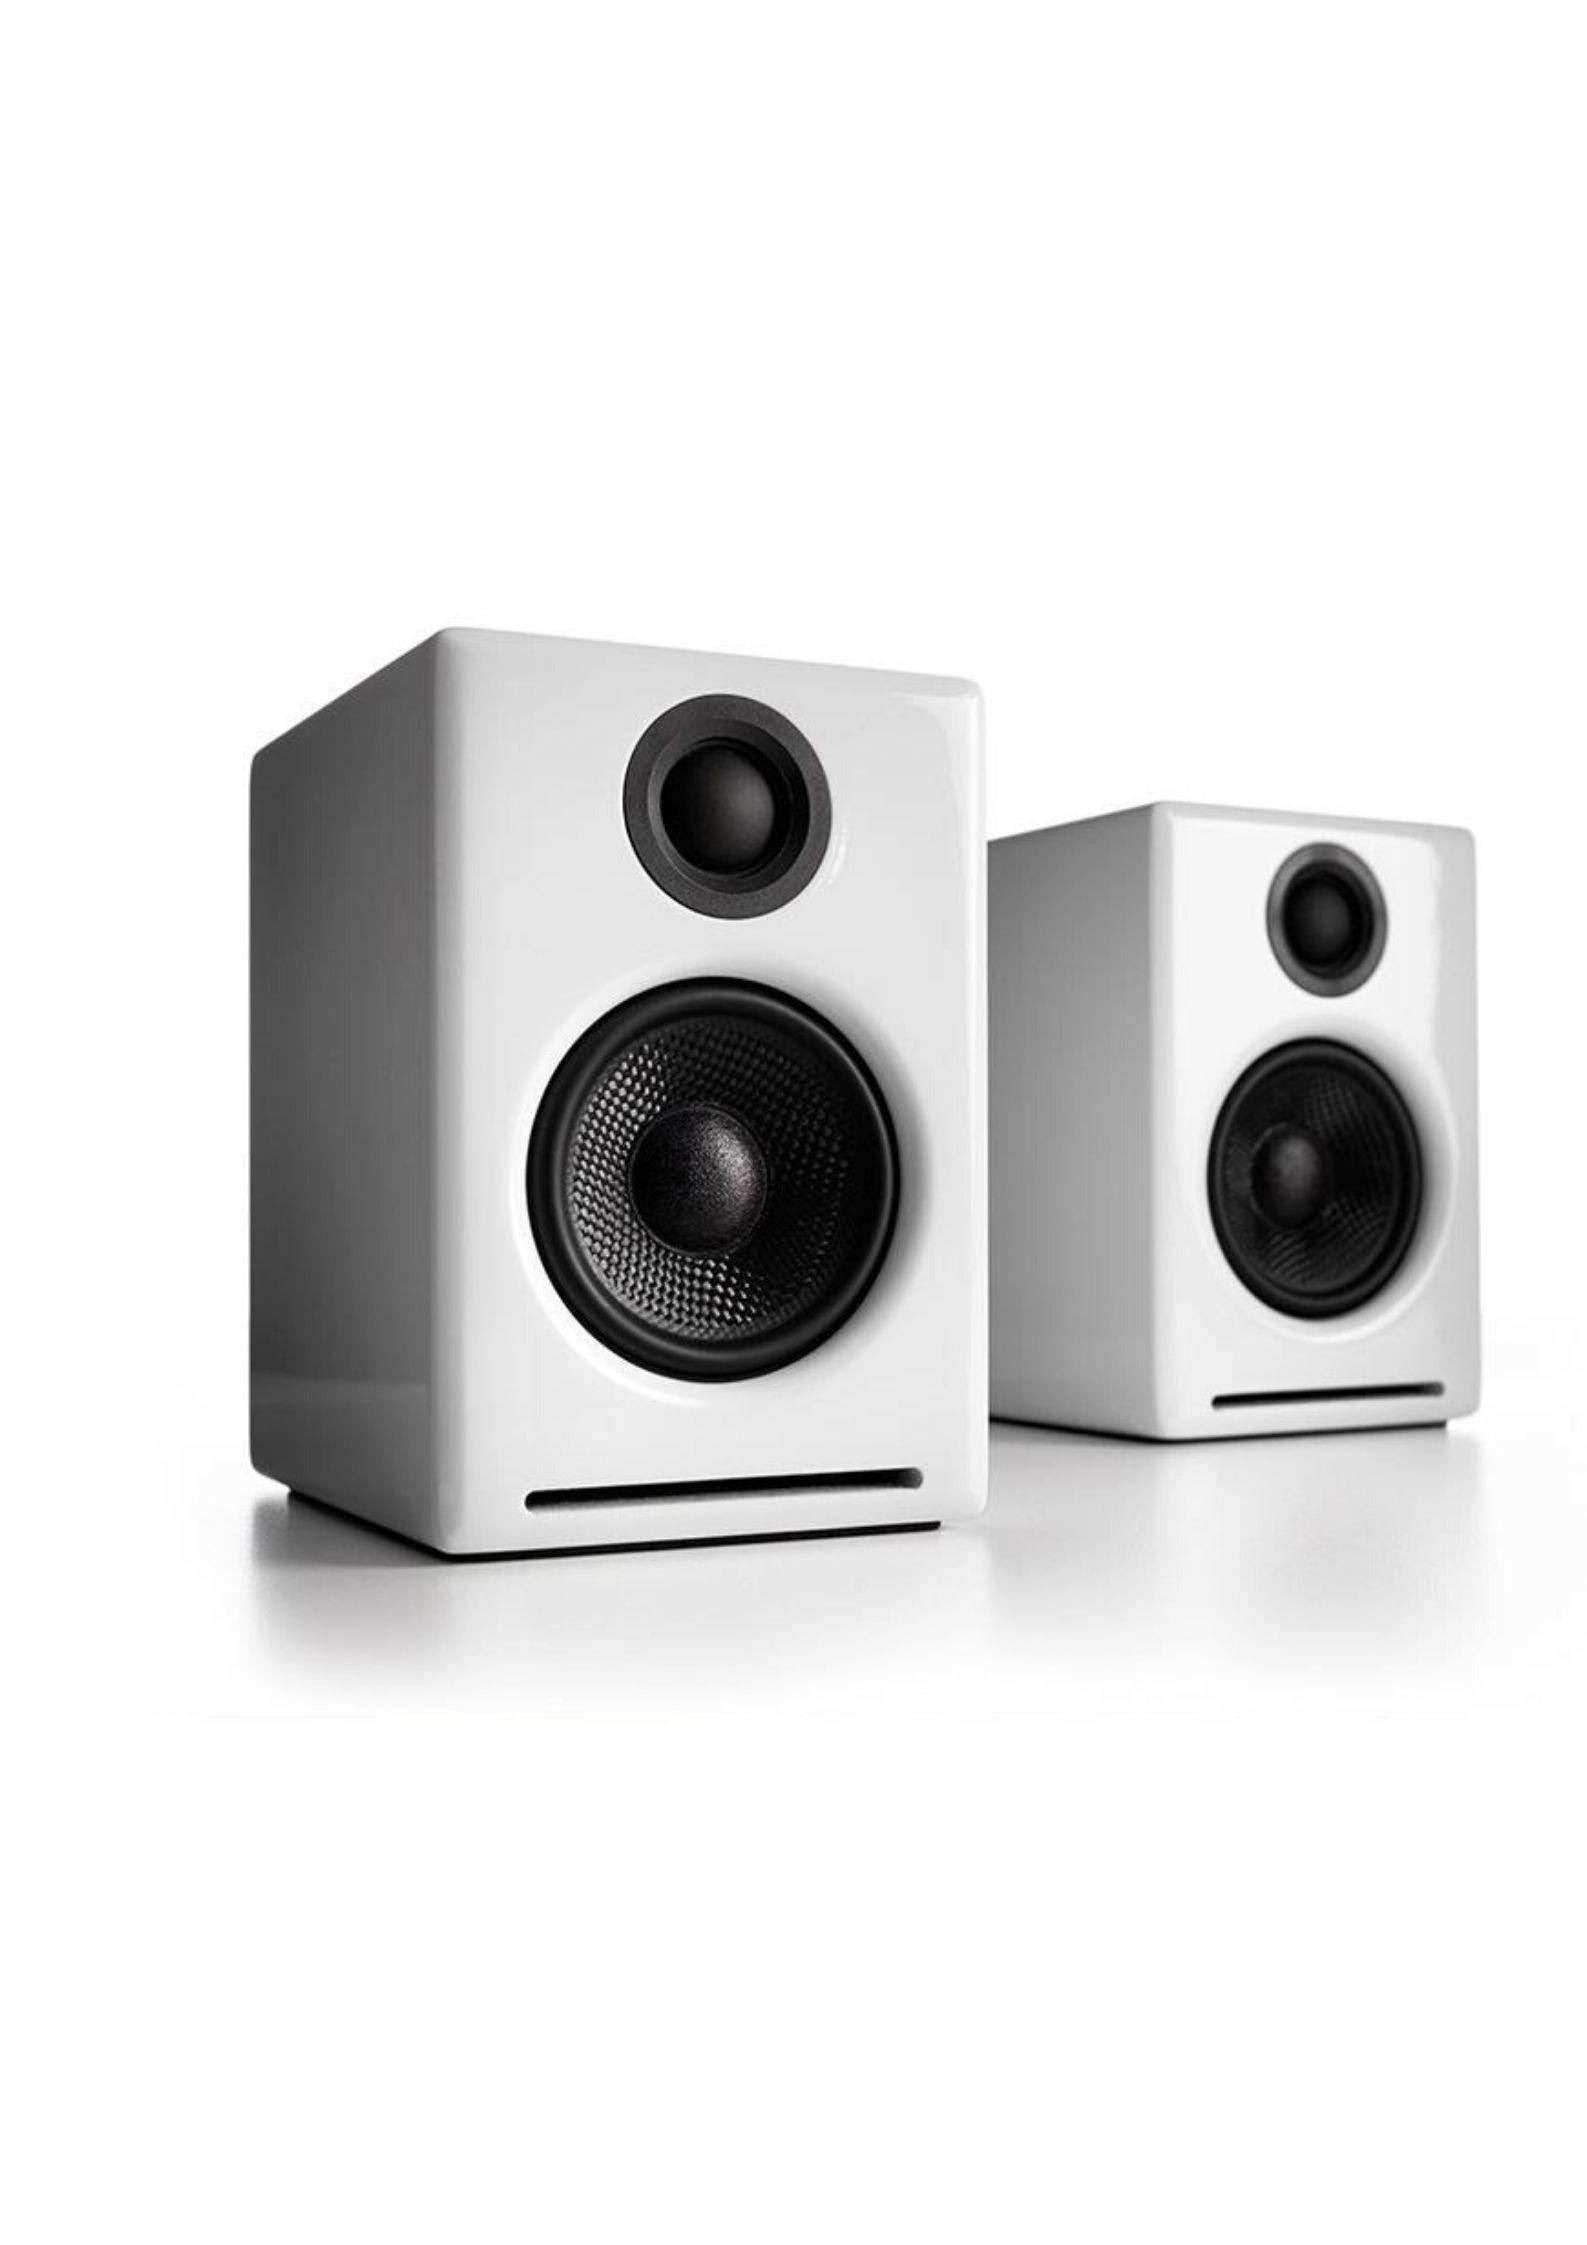 Audioengine A2+Wireless Ασύρματα Αυτοενισχυόμενα Ηχεία Υπολογιστή White